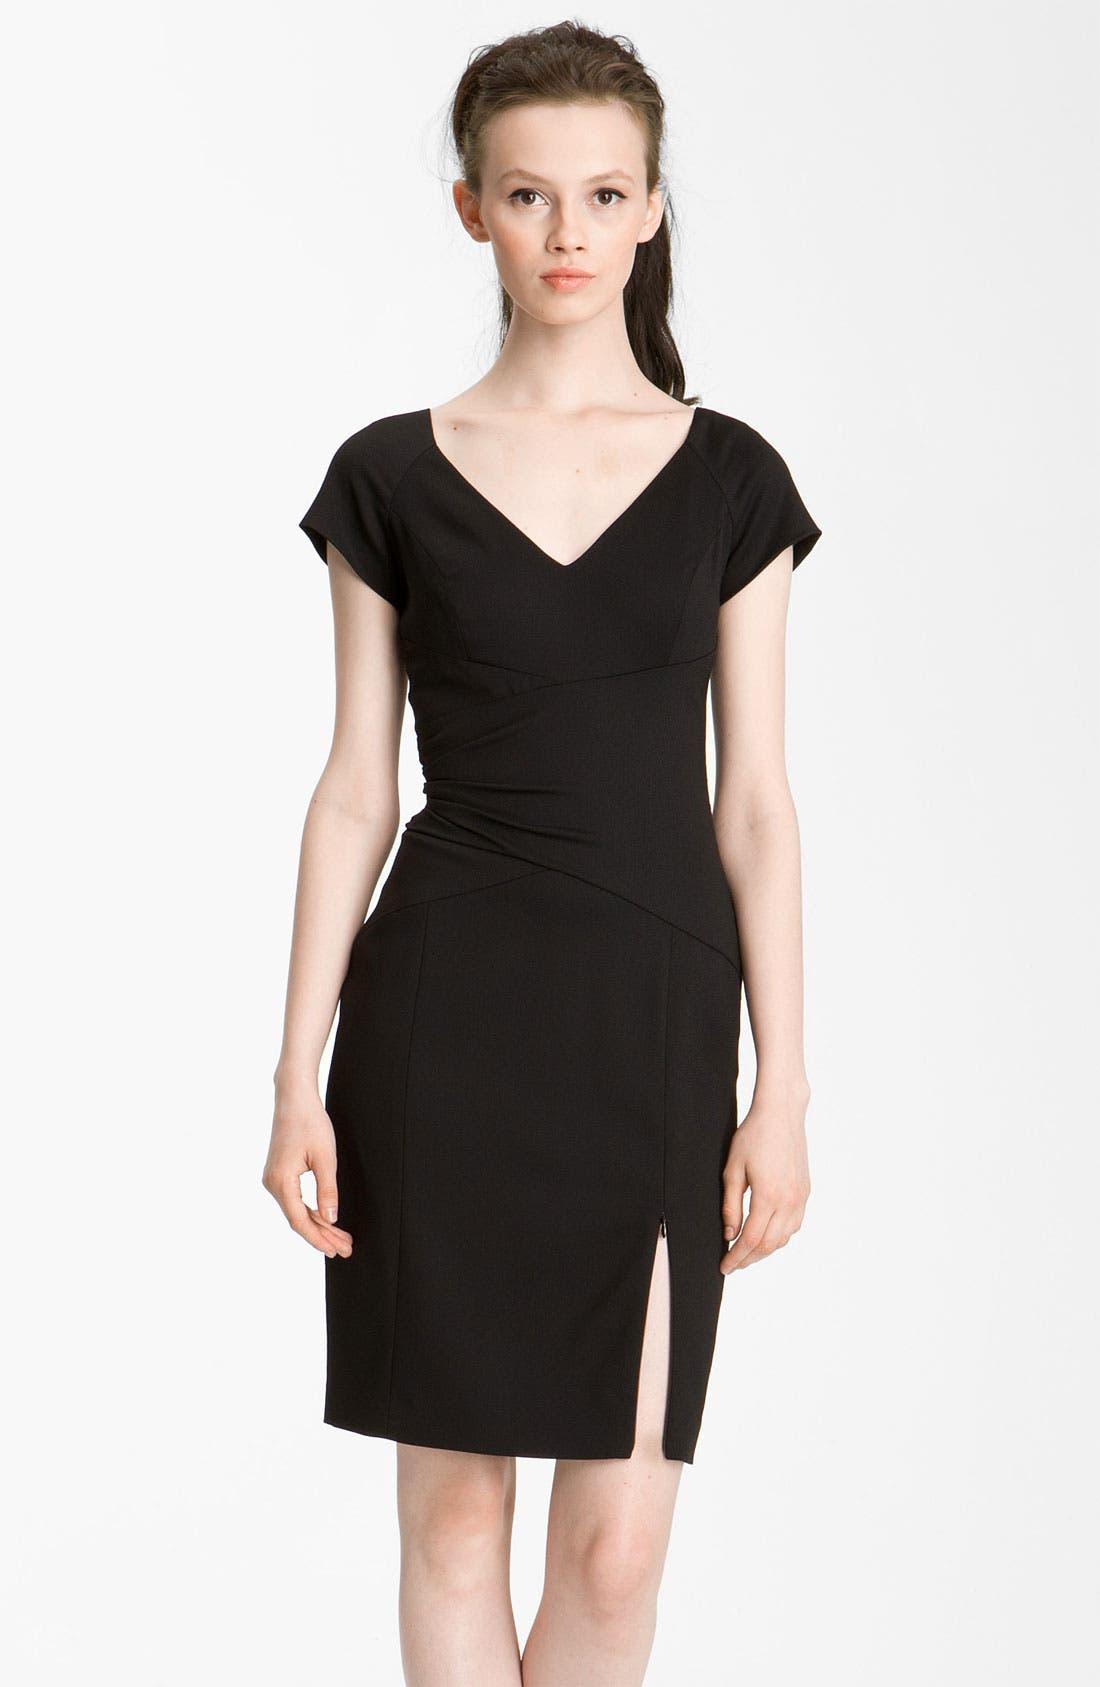 Alternate Image 1 Selected - Rachel Zoe 'Katherine' Raglan Sleeve Dress